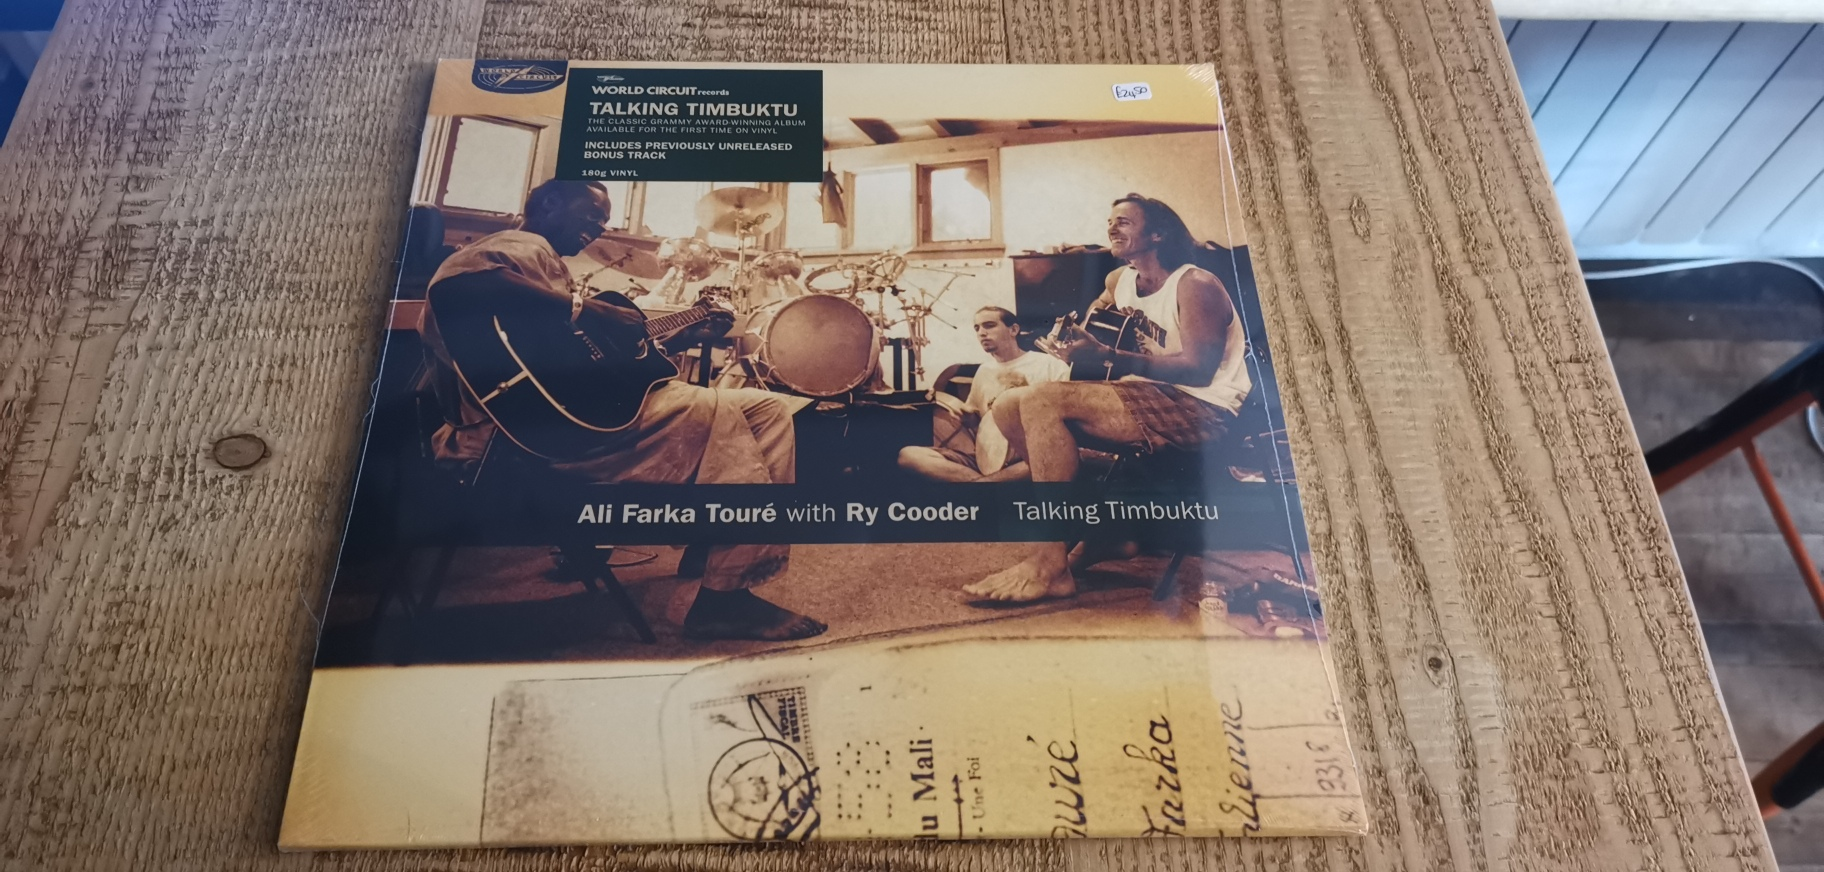 Ali Farka Toure with Ry Cooder - Talking Timbuktu